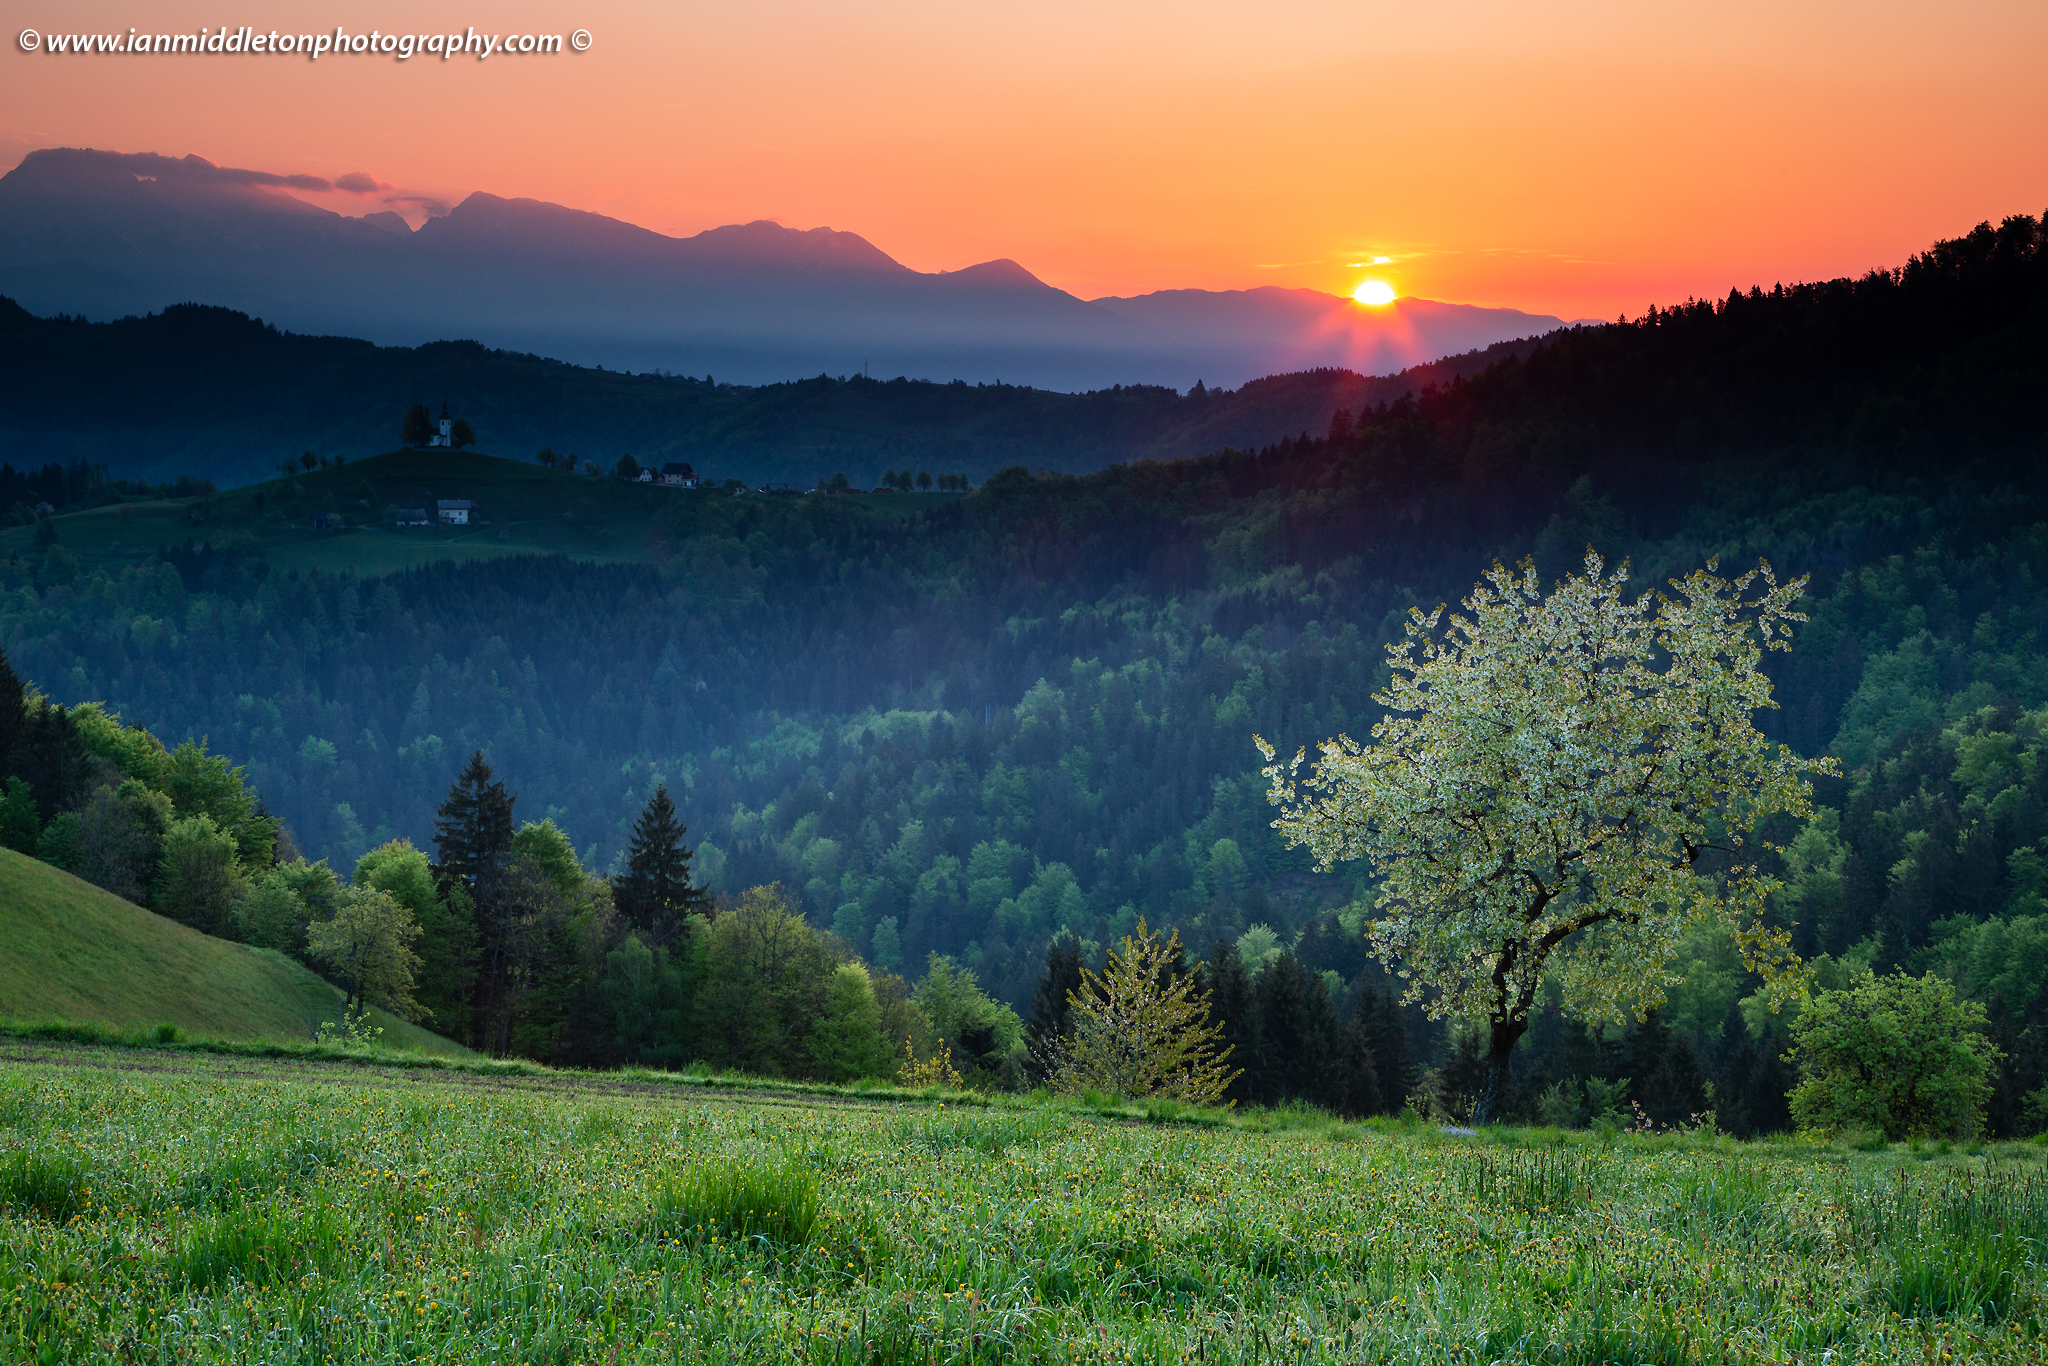 Springtime view at sunrise from Rantovše hill across to Sveti Tomaz nad Praprotnim (church of Saint Thomas) and the Kamnik Alps, Slovenia.